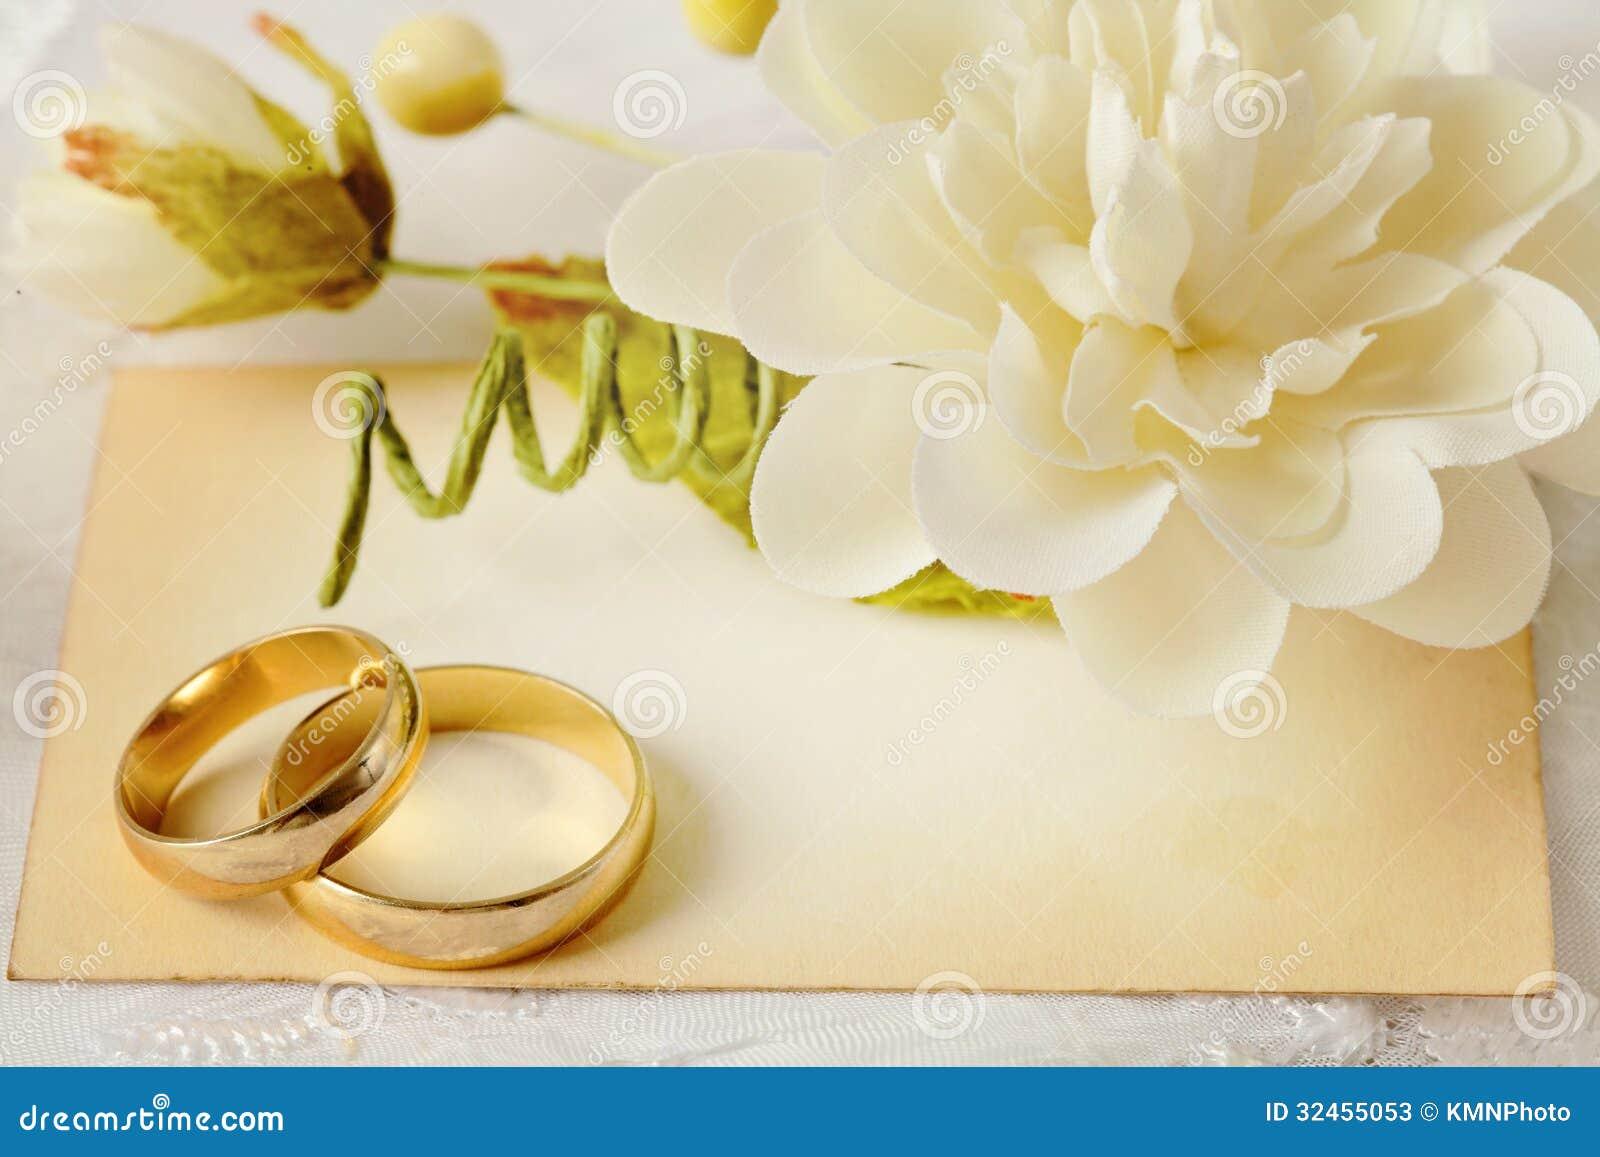 invitation de mariage photos stock - Boutonnire Invit Mariage